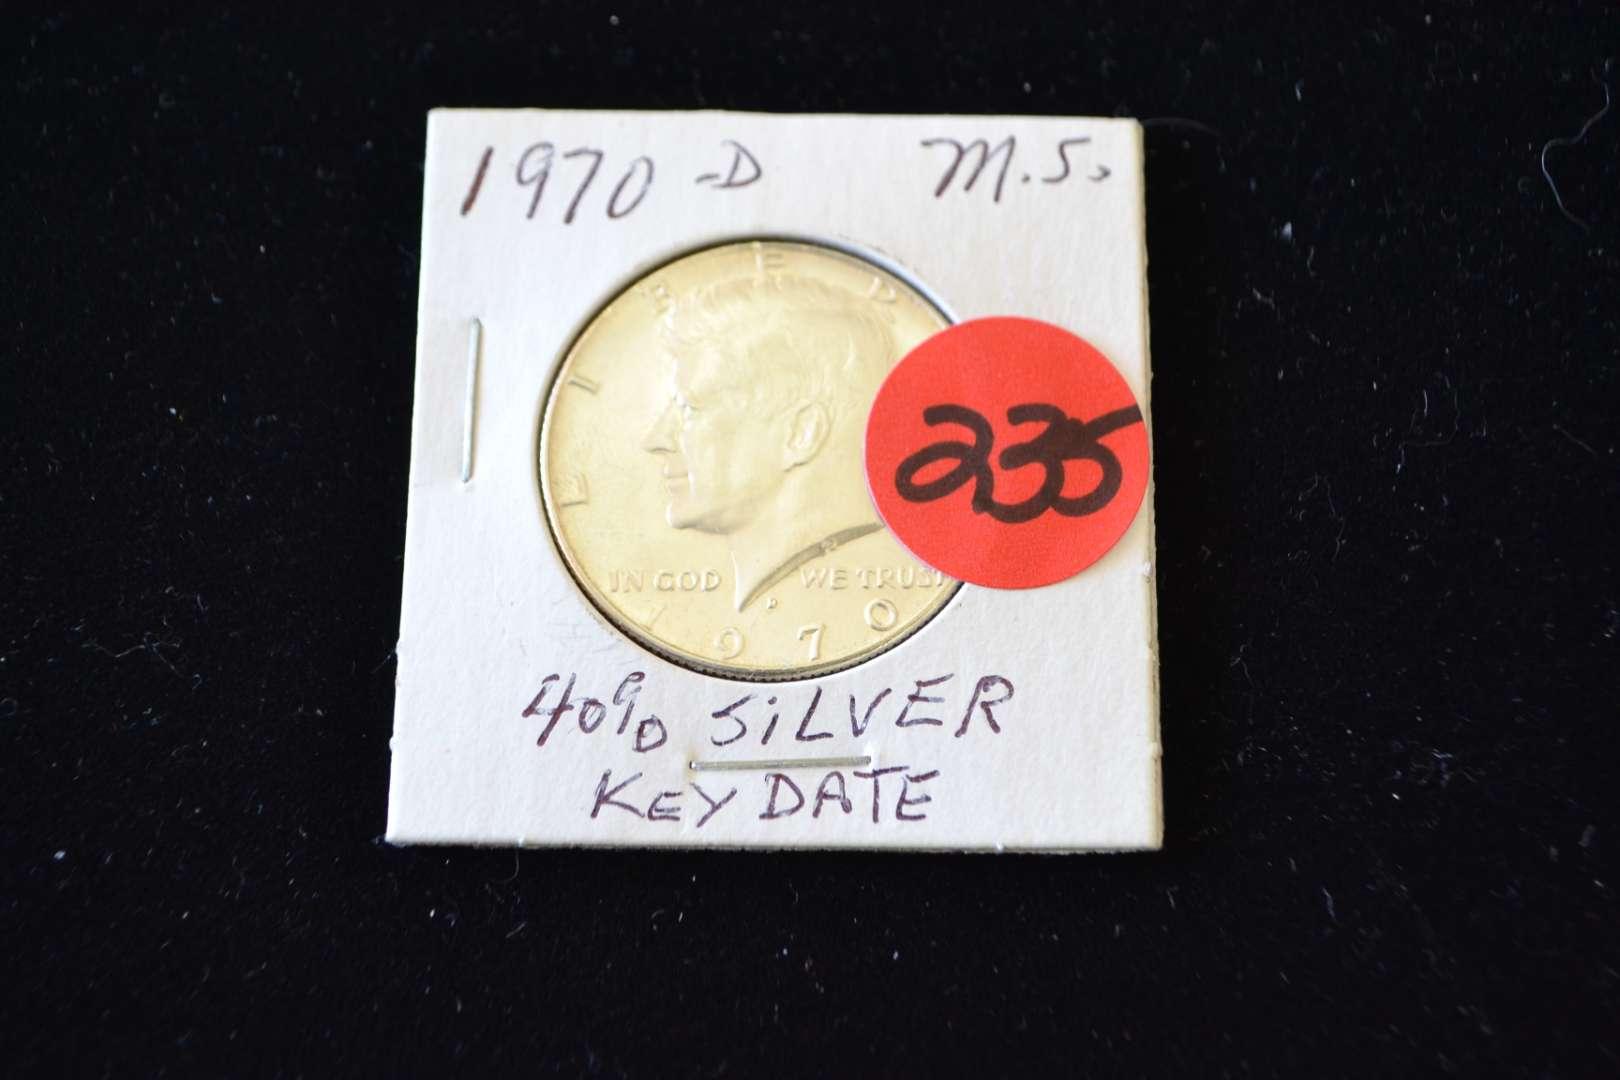 Lot # 235 1970 D SILVER HALF DOLLAR (KEY DATE)